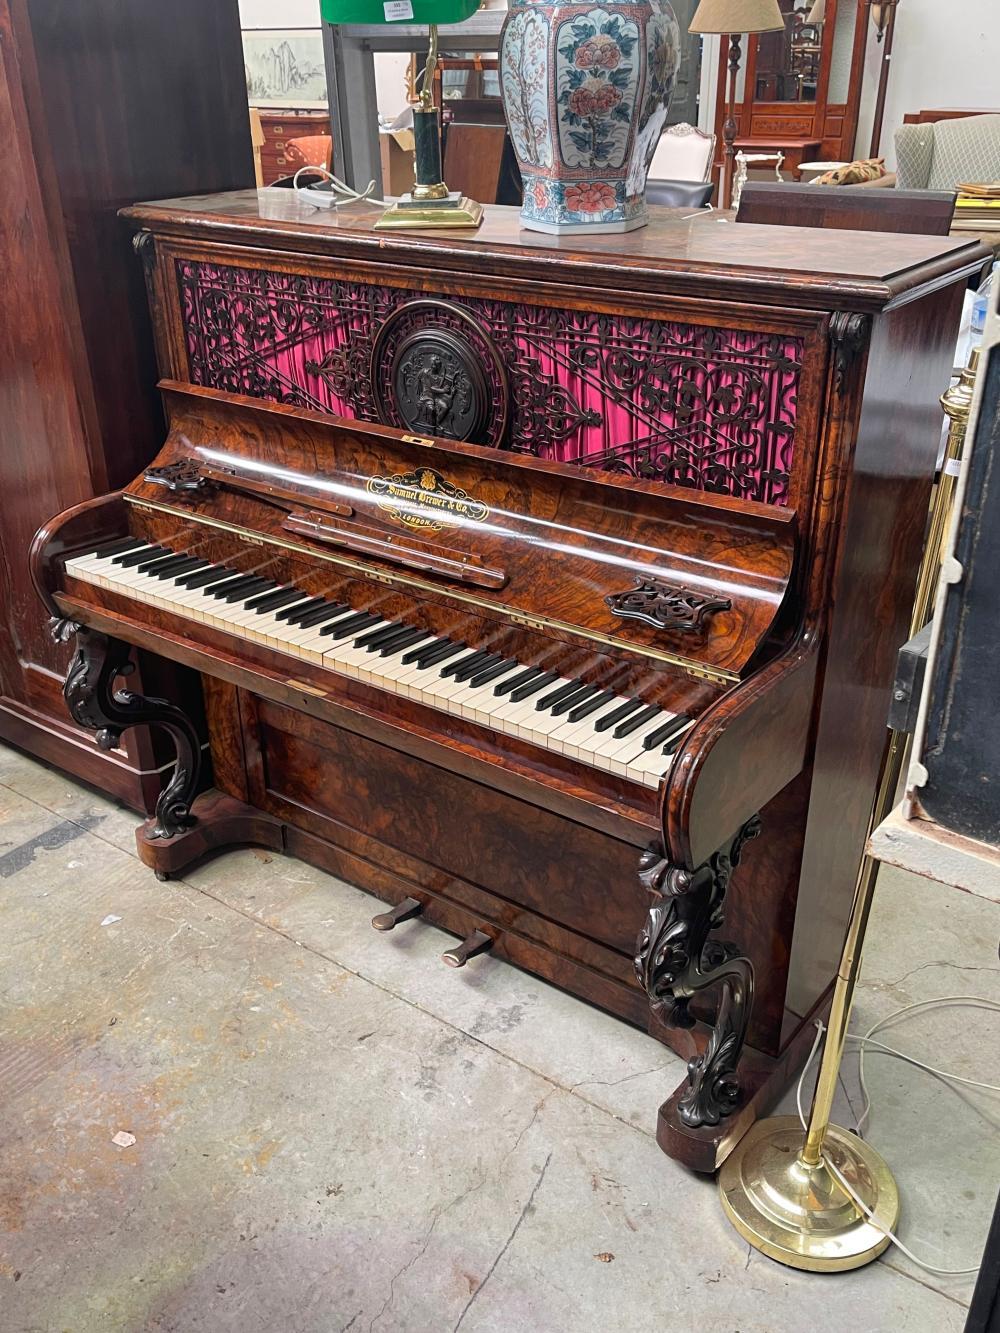 Antique Samuel Brewer & Co London upright piano, in figured walnut, approx 126cm H x 129cm W x 66cm D